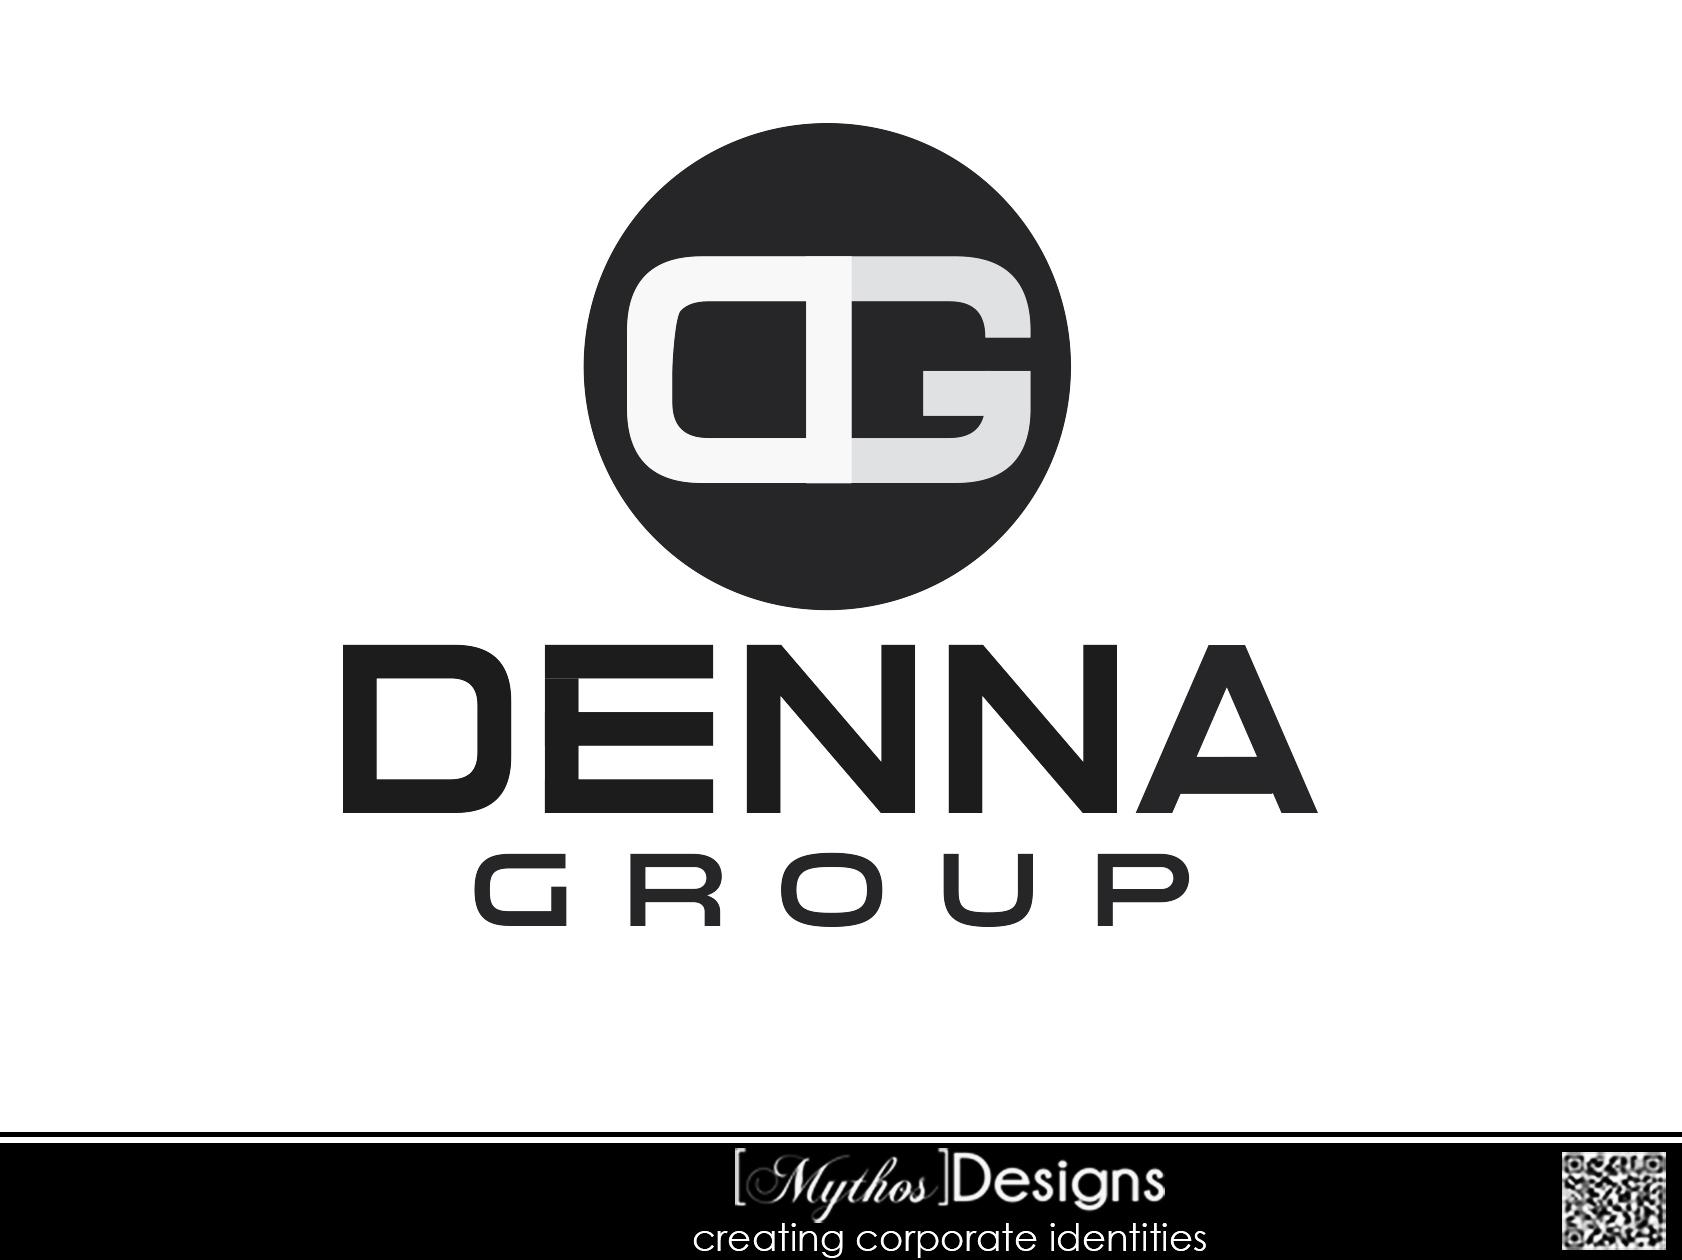 Logo Design by Mythos Designs - Entry No. 221 in the Logo Design Contest Denna Group Logo Design.